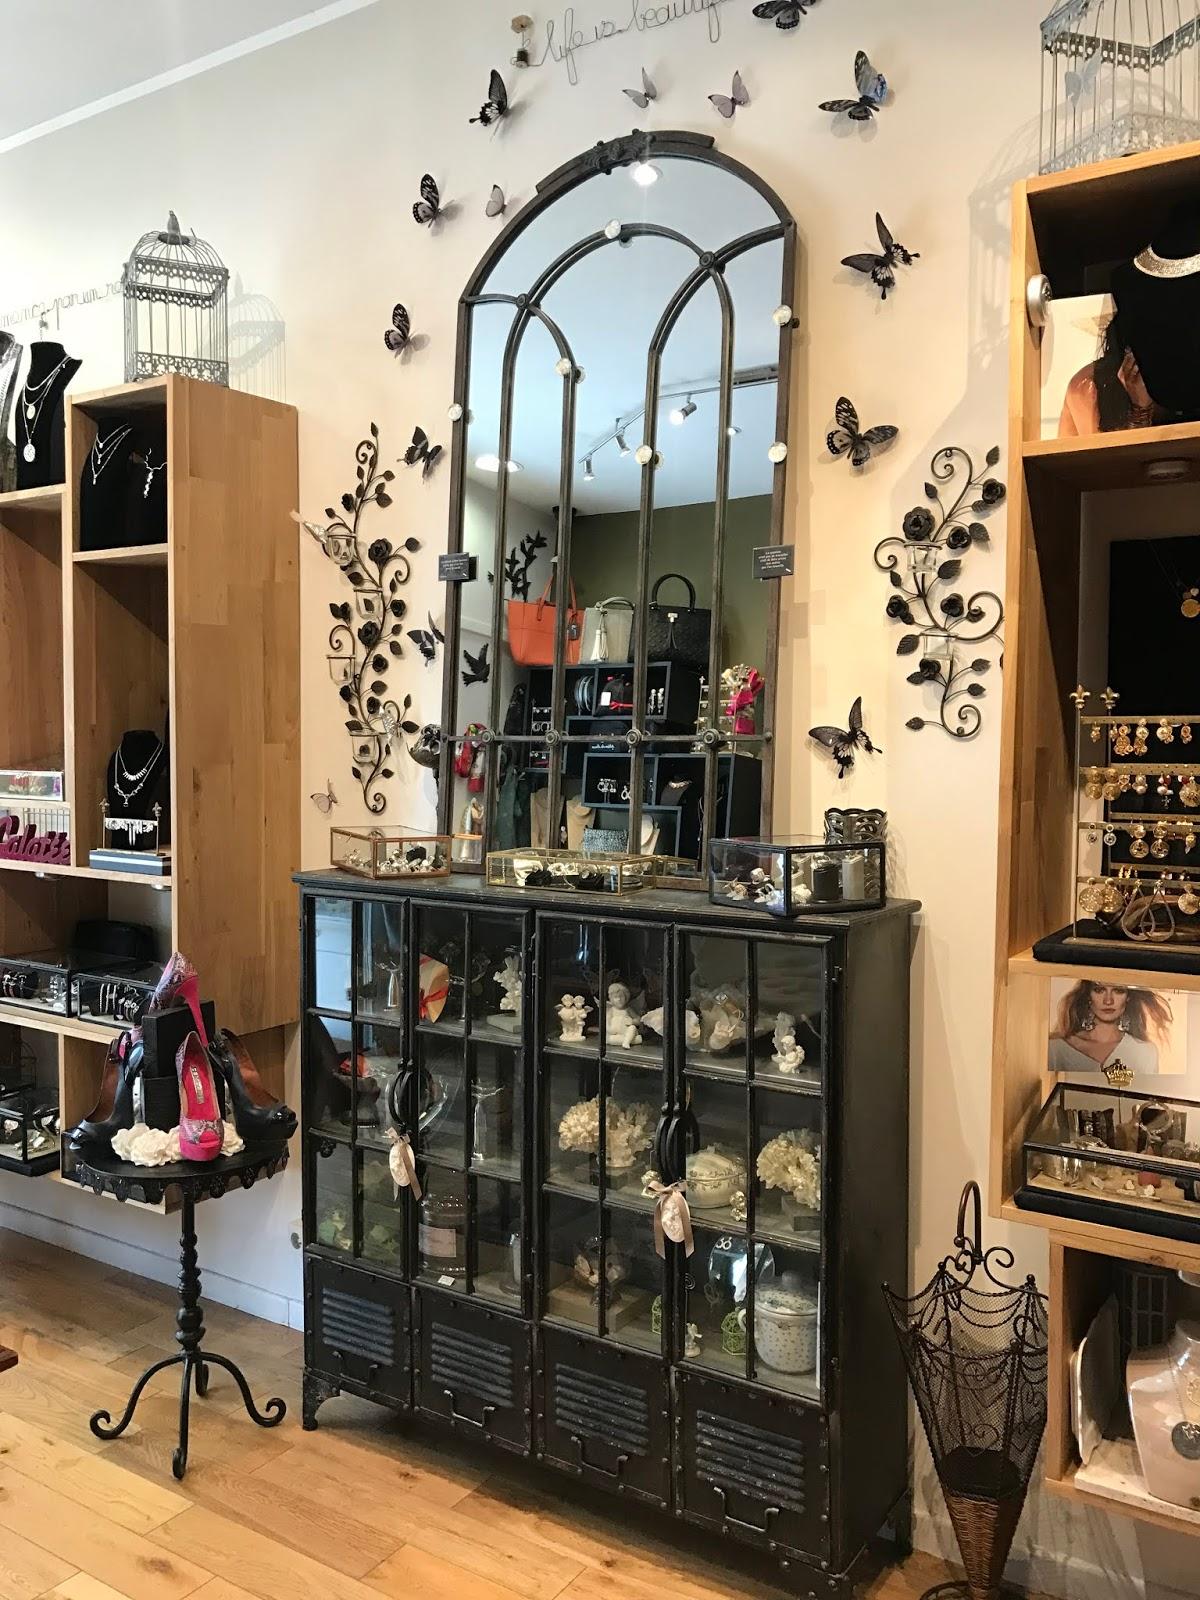 4-galatee-vente-de-bijoux-de-createurs-boulogne-billancourt